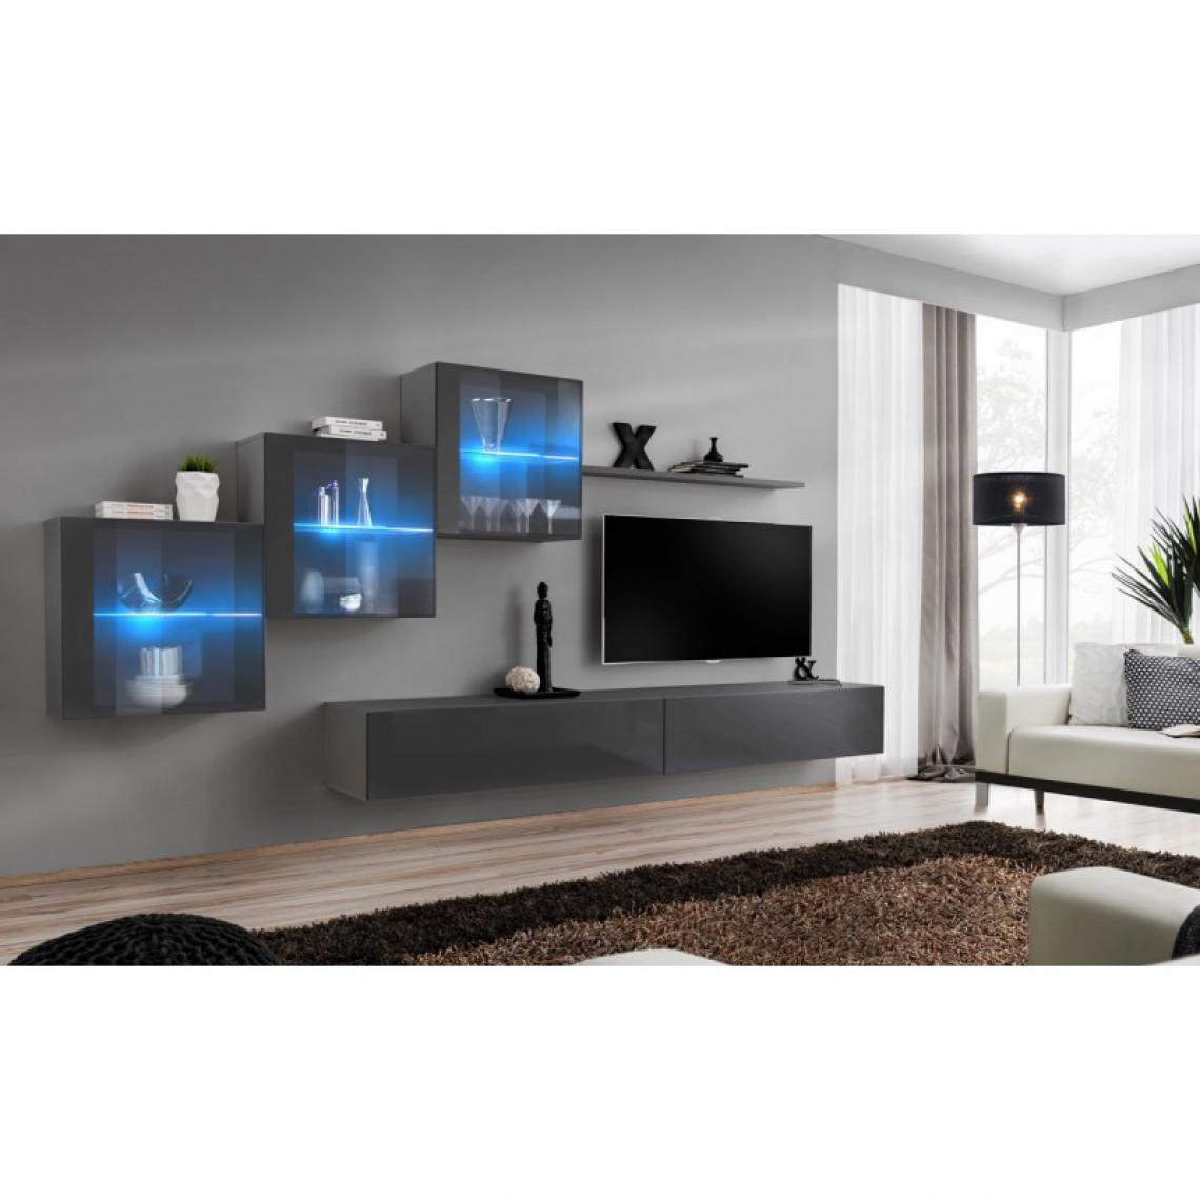 Ac-Deco Meuble TV Mural Design Switch XX 330cm Gris